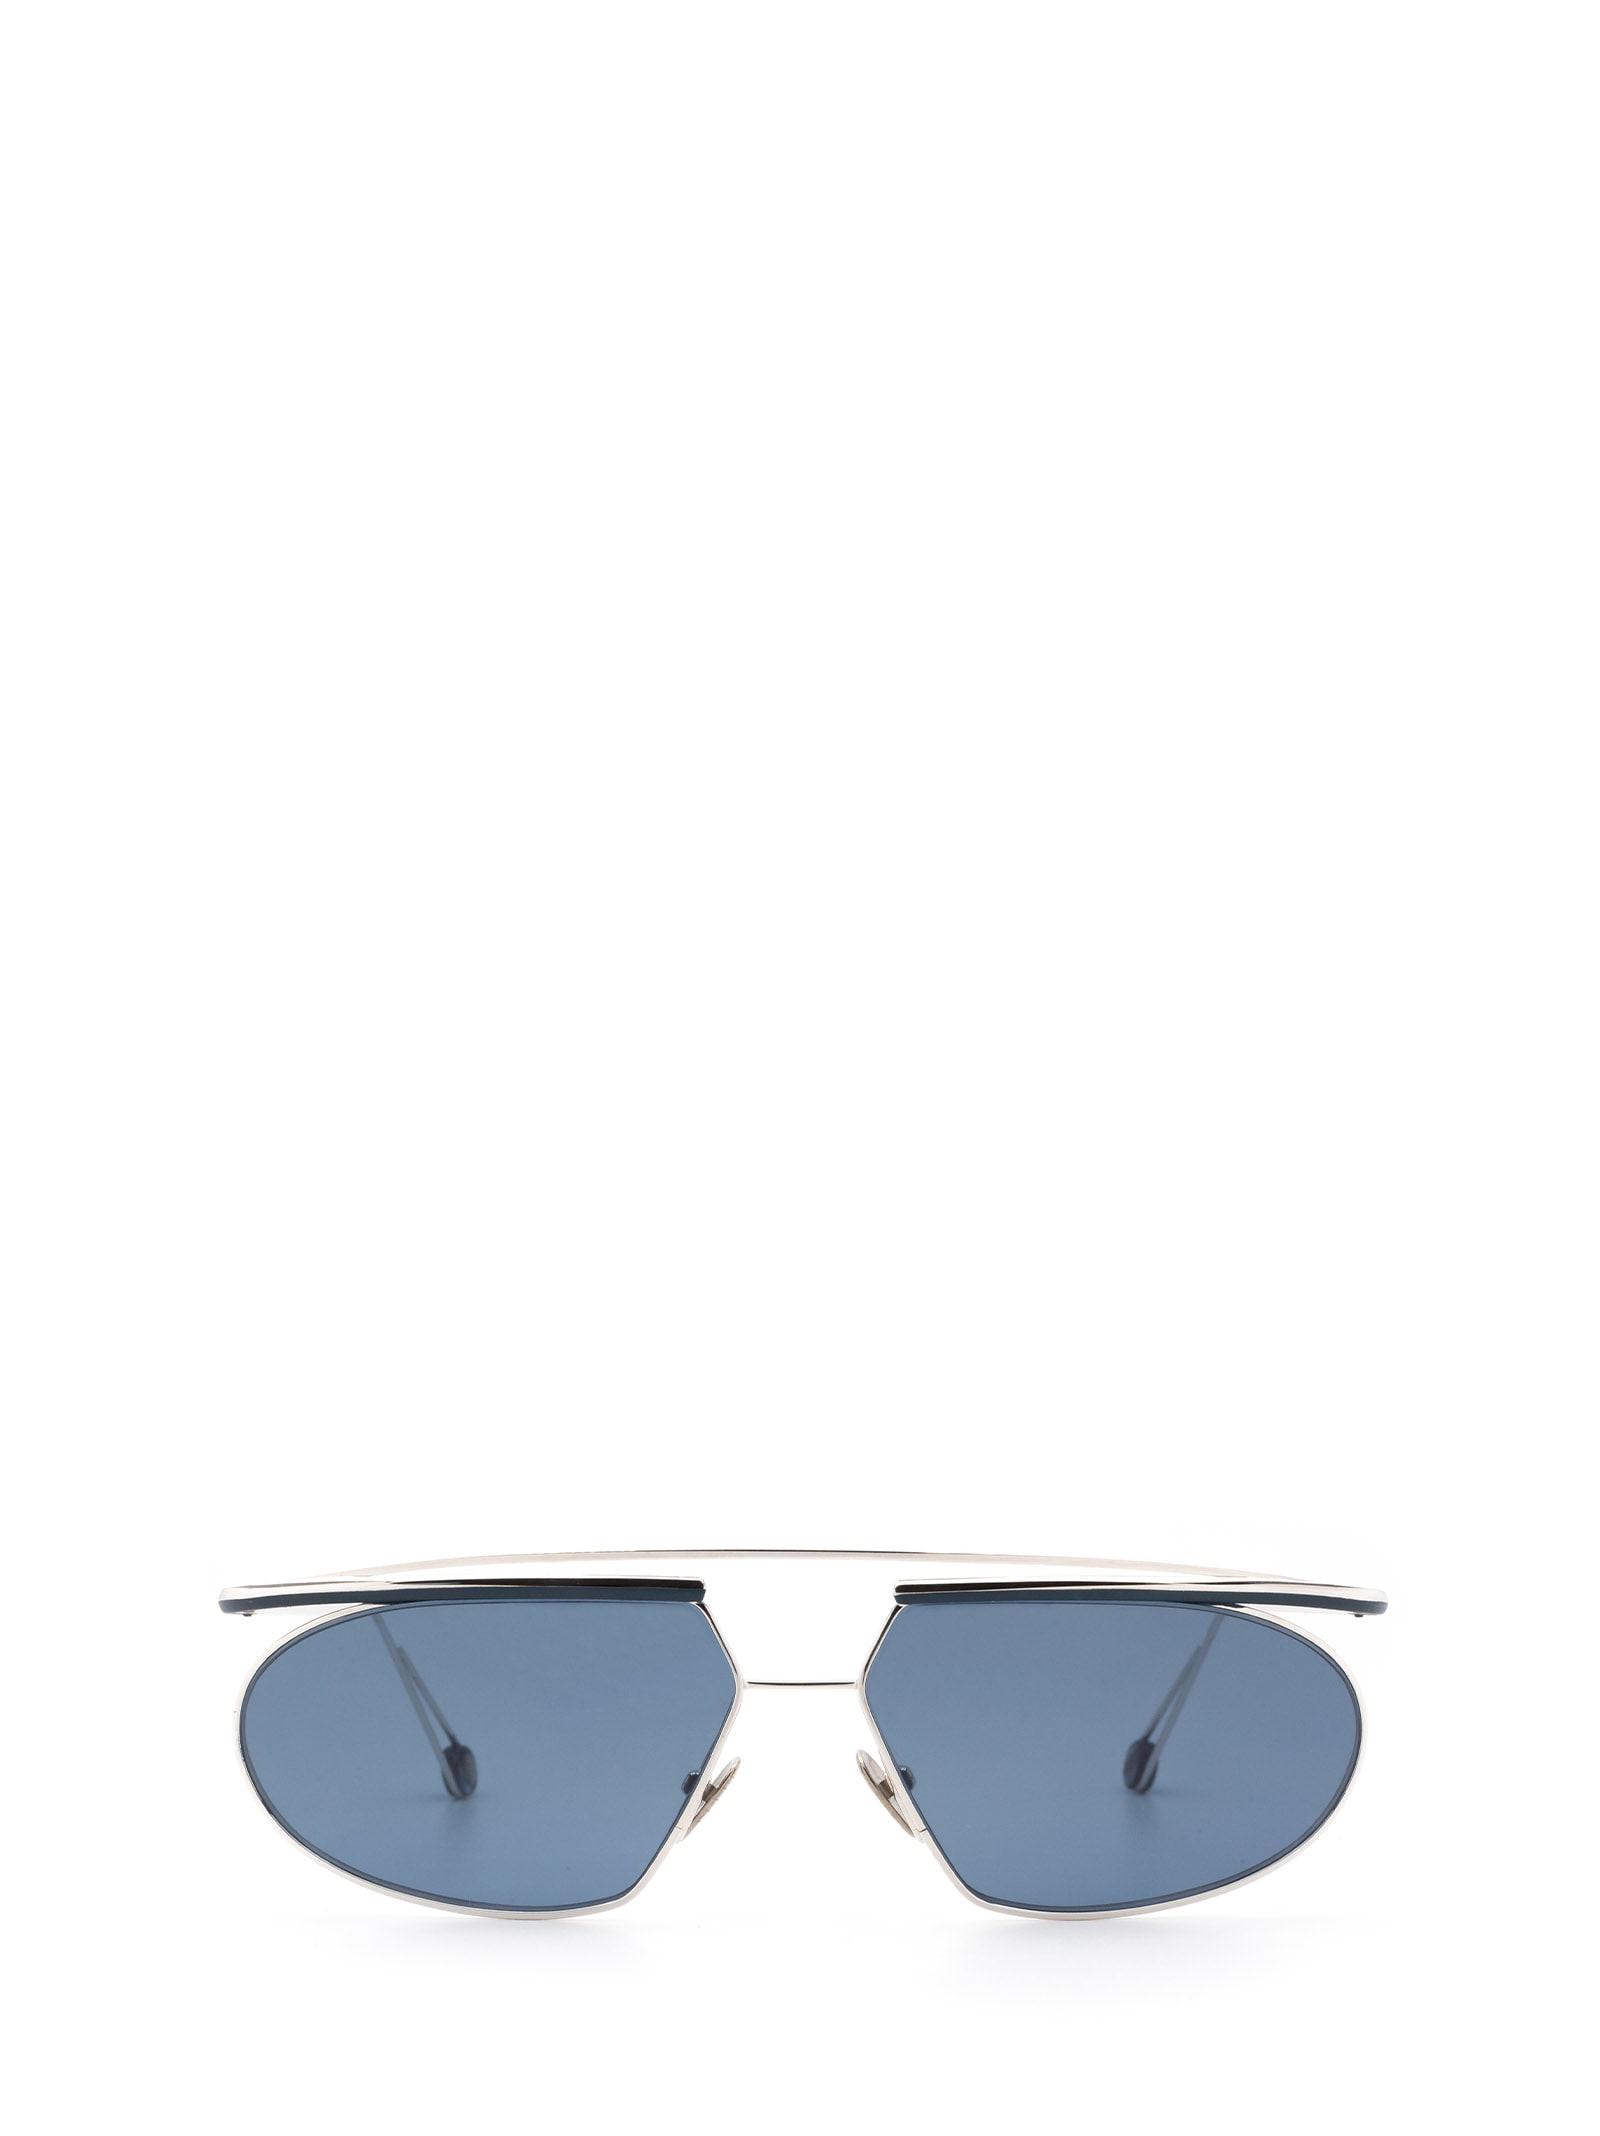 AHLEM Ahlem Place Tokyo White Gold/blue Sunglasses